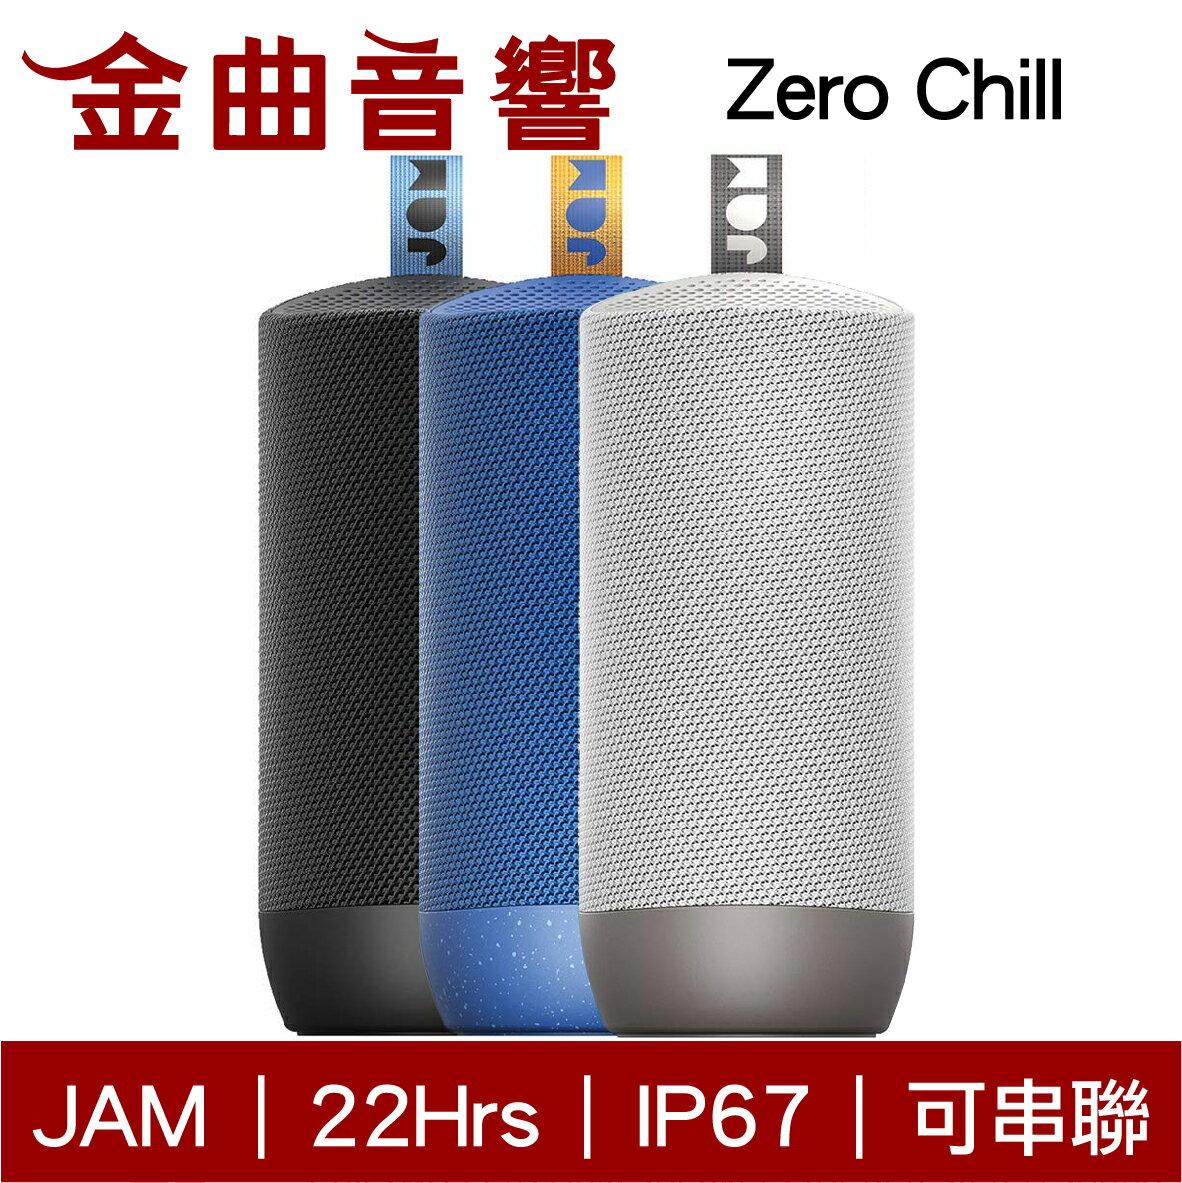 JAM Zero Chill 藍牙喇叭 HX-P606   金曲音響